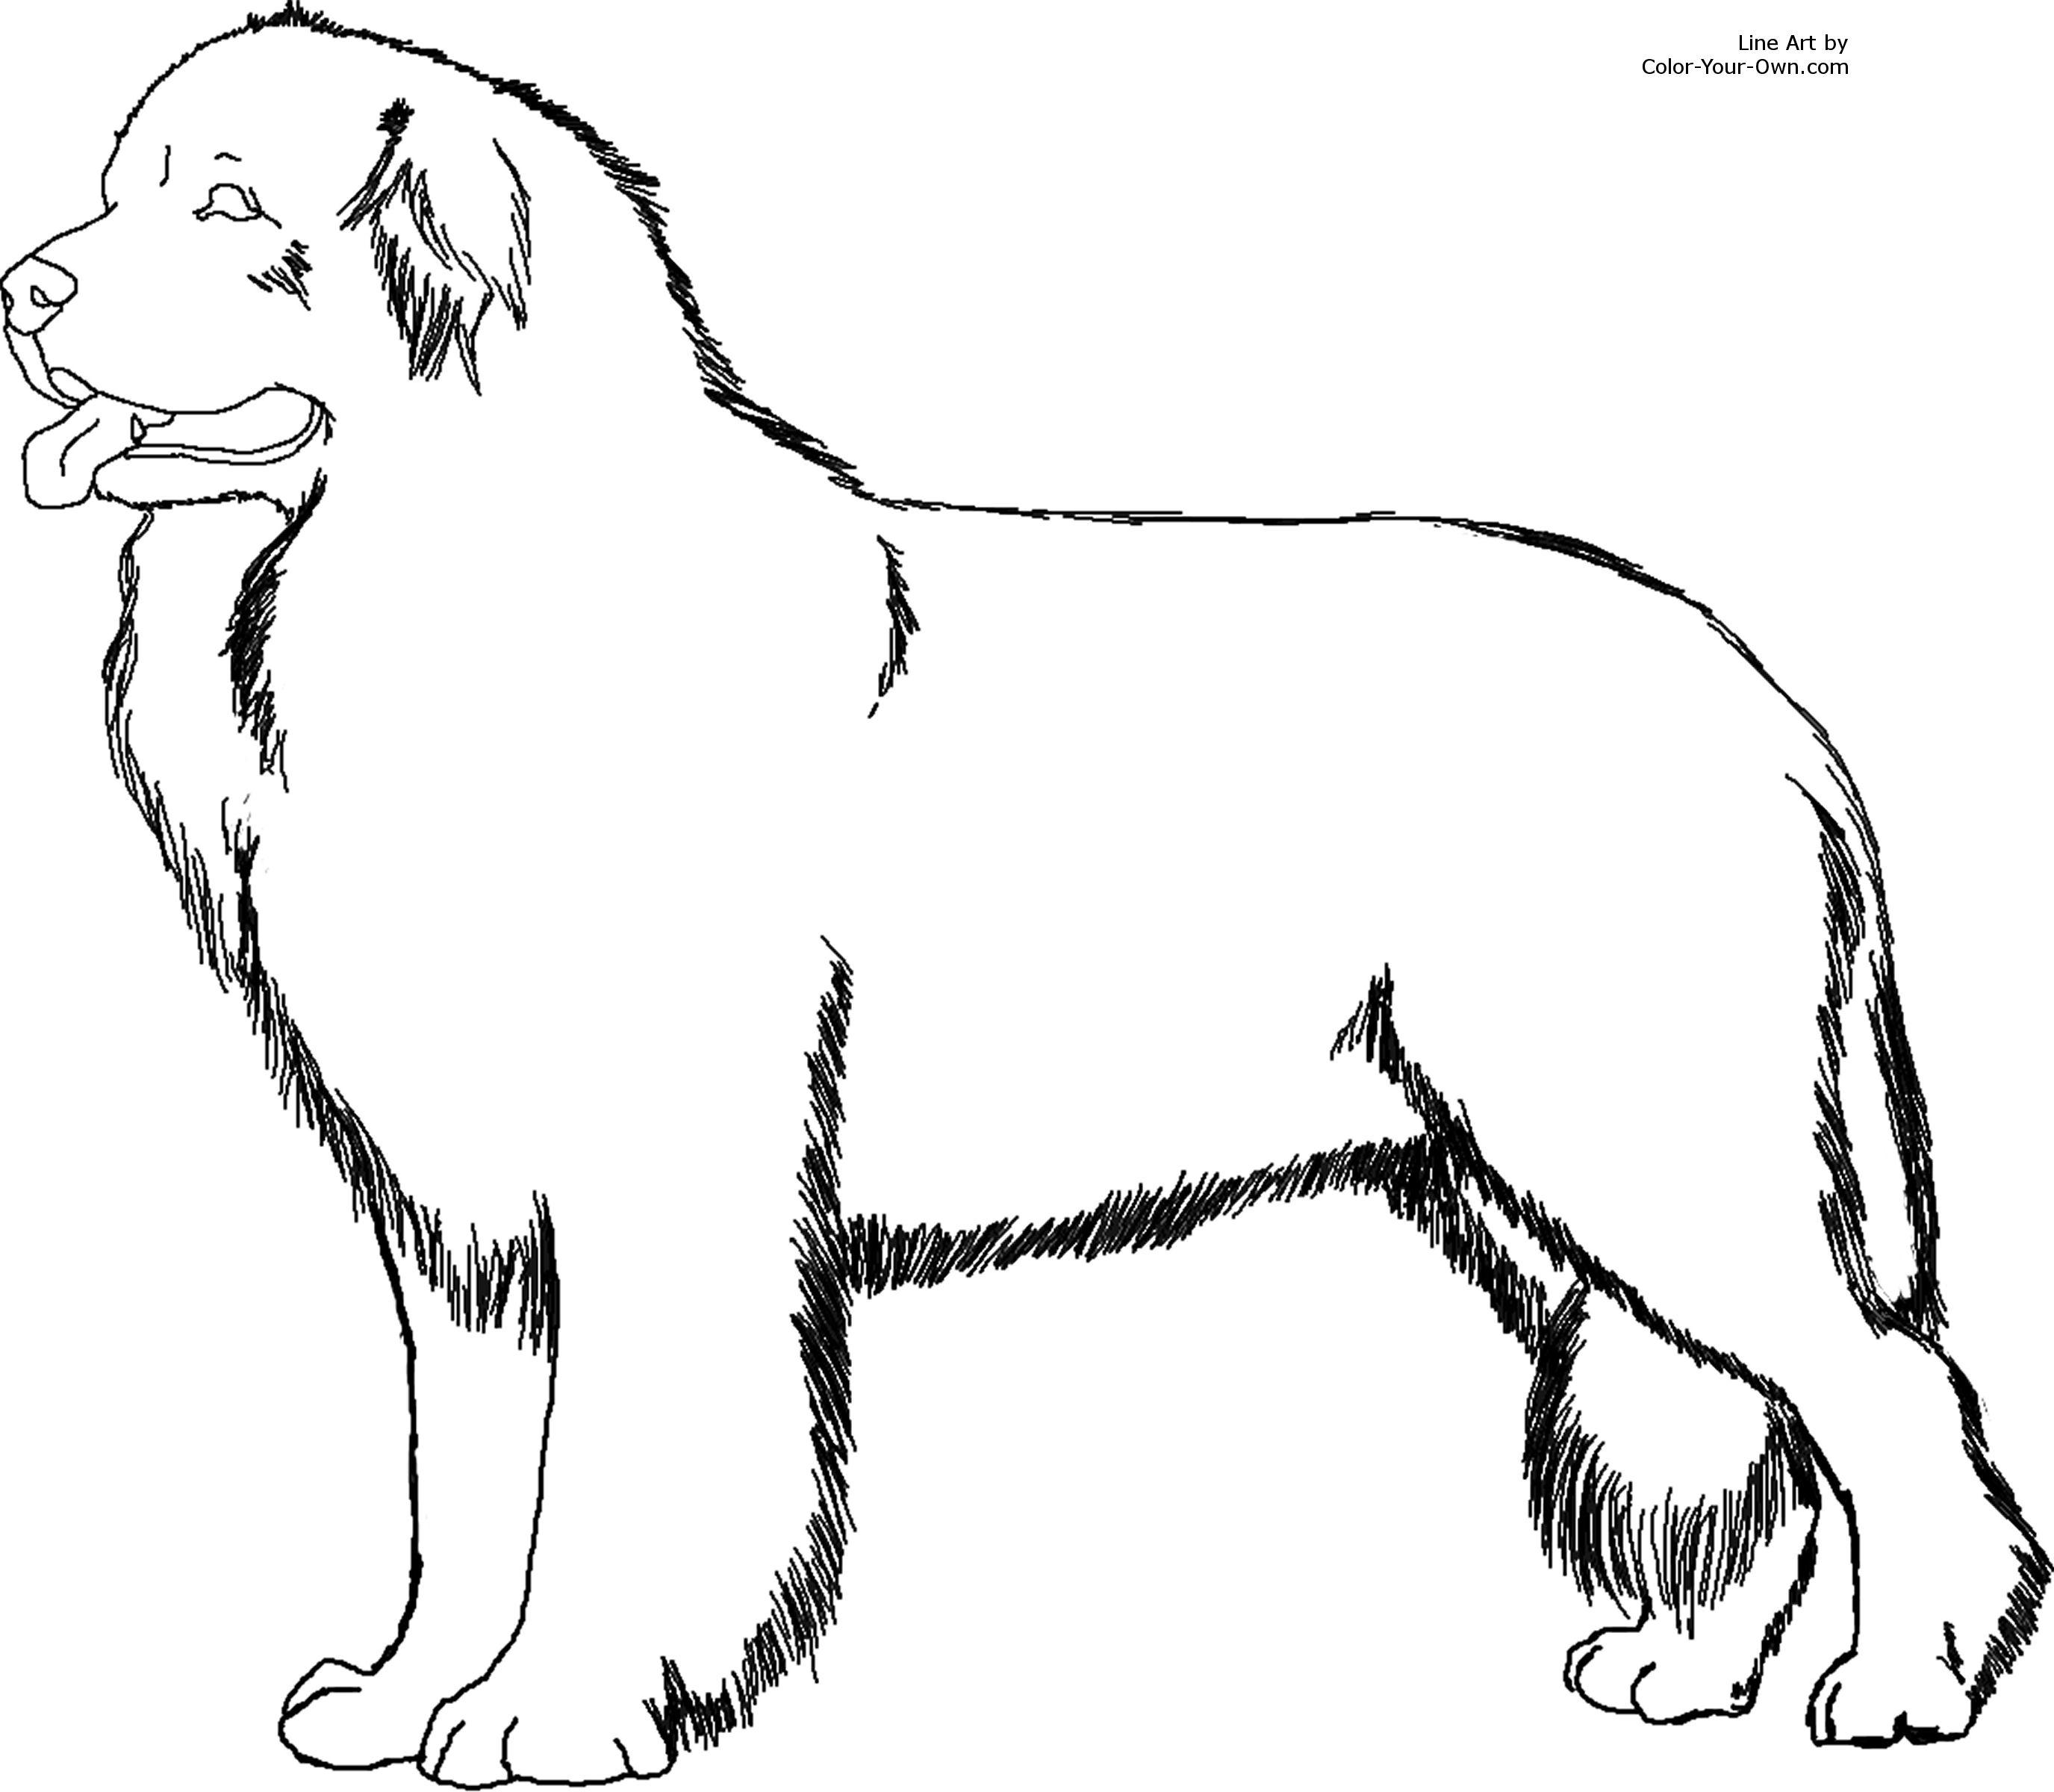 Big Dog Cliparts | Free download best Big Dog Cliparts on ClipArtMag.com